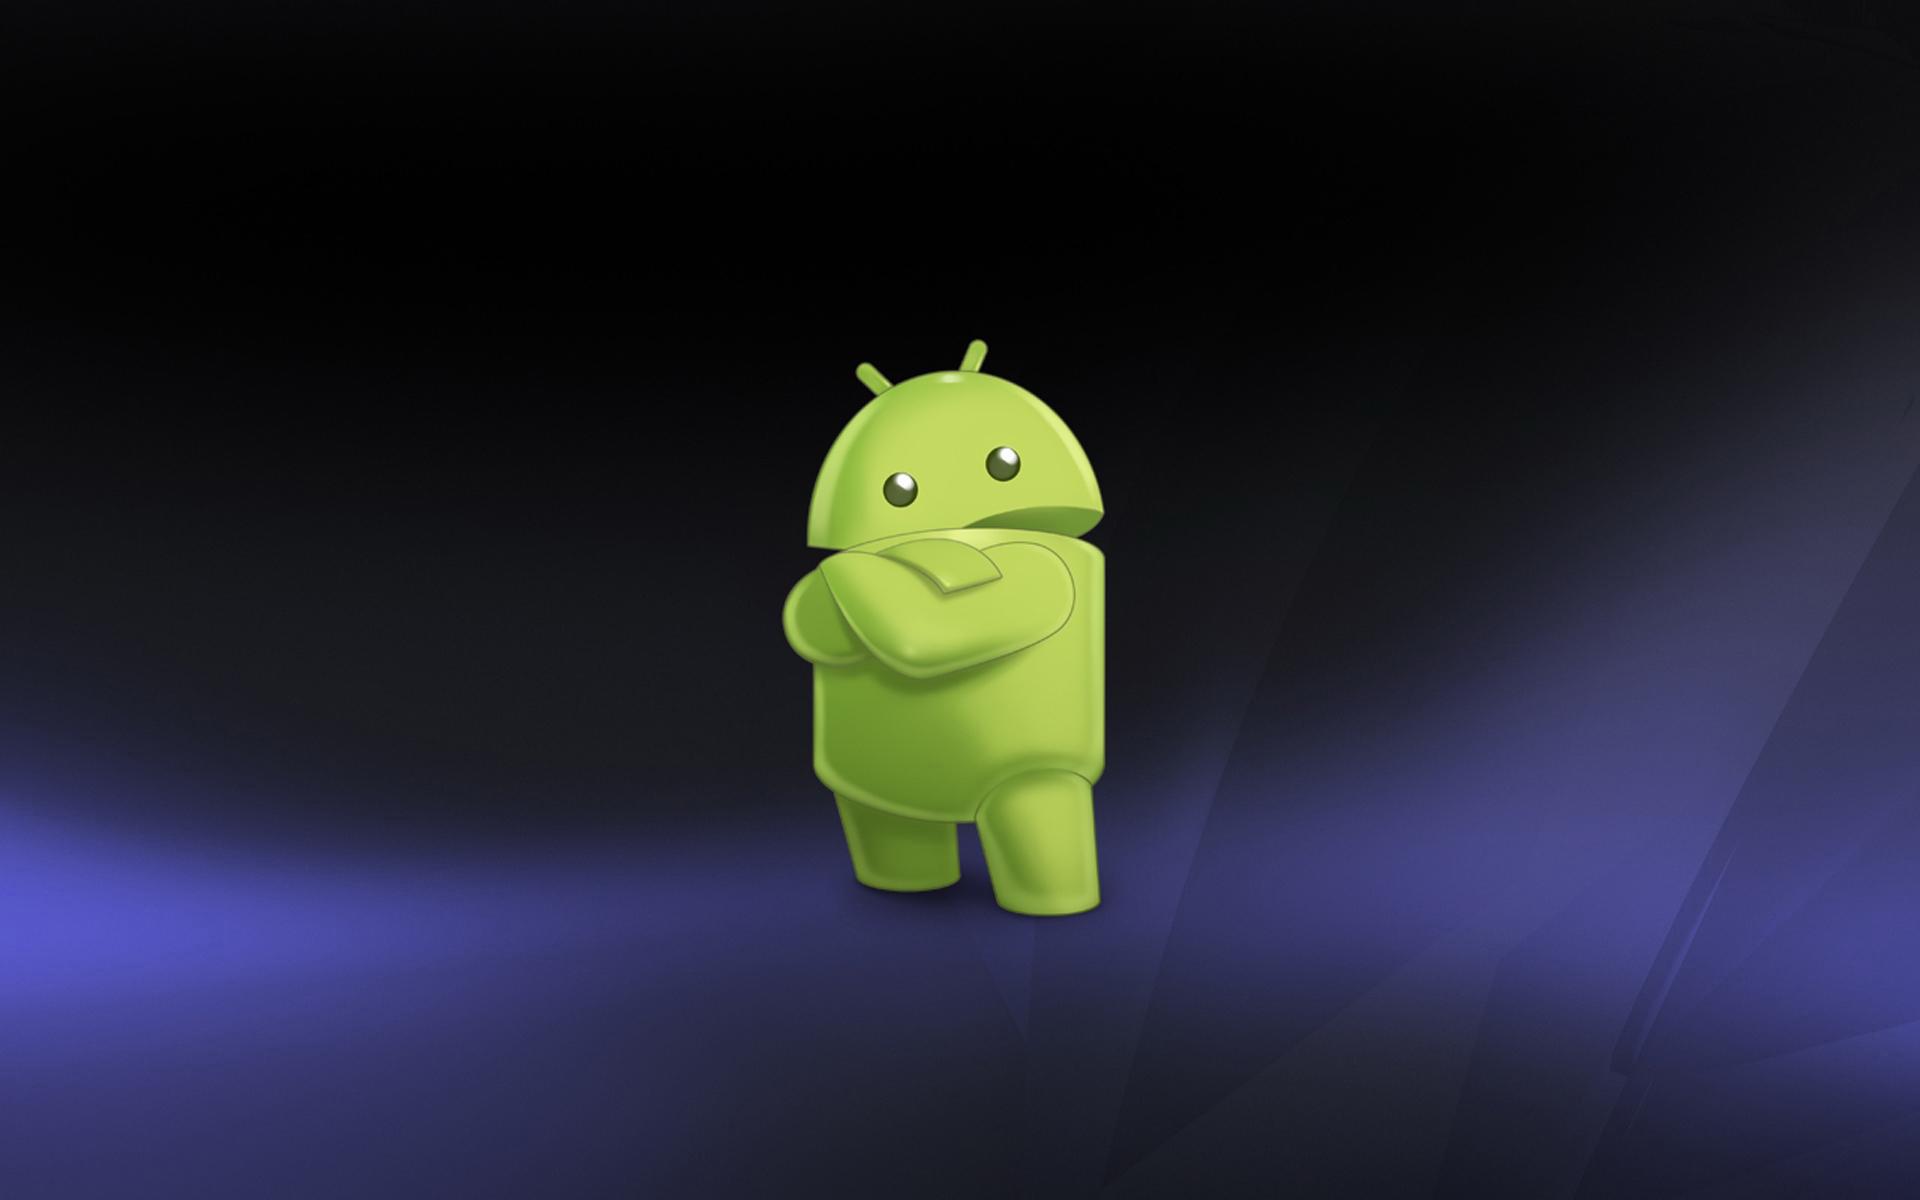 картинки на заставку андроид